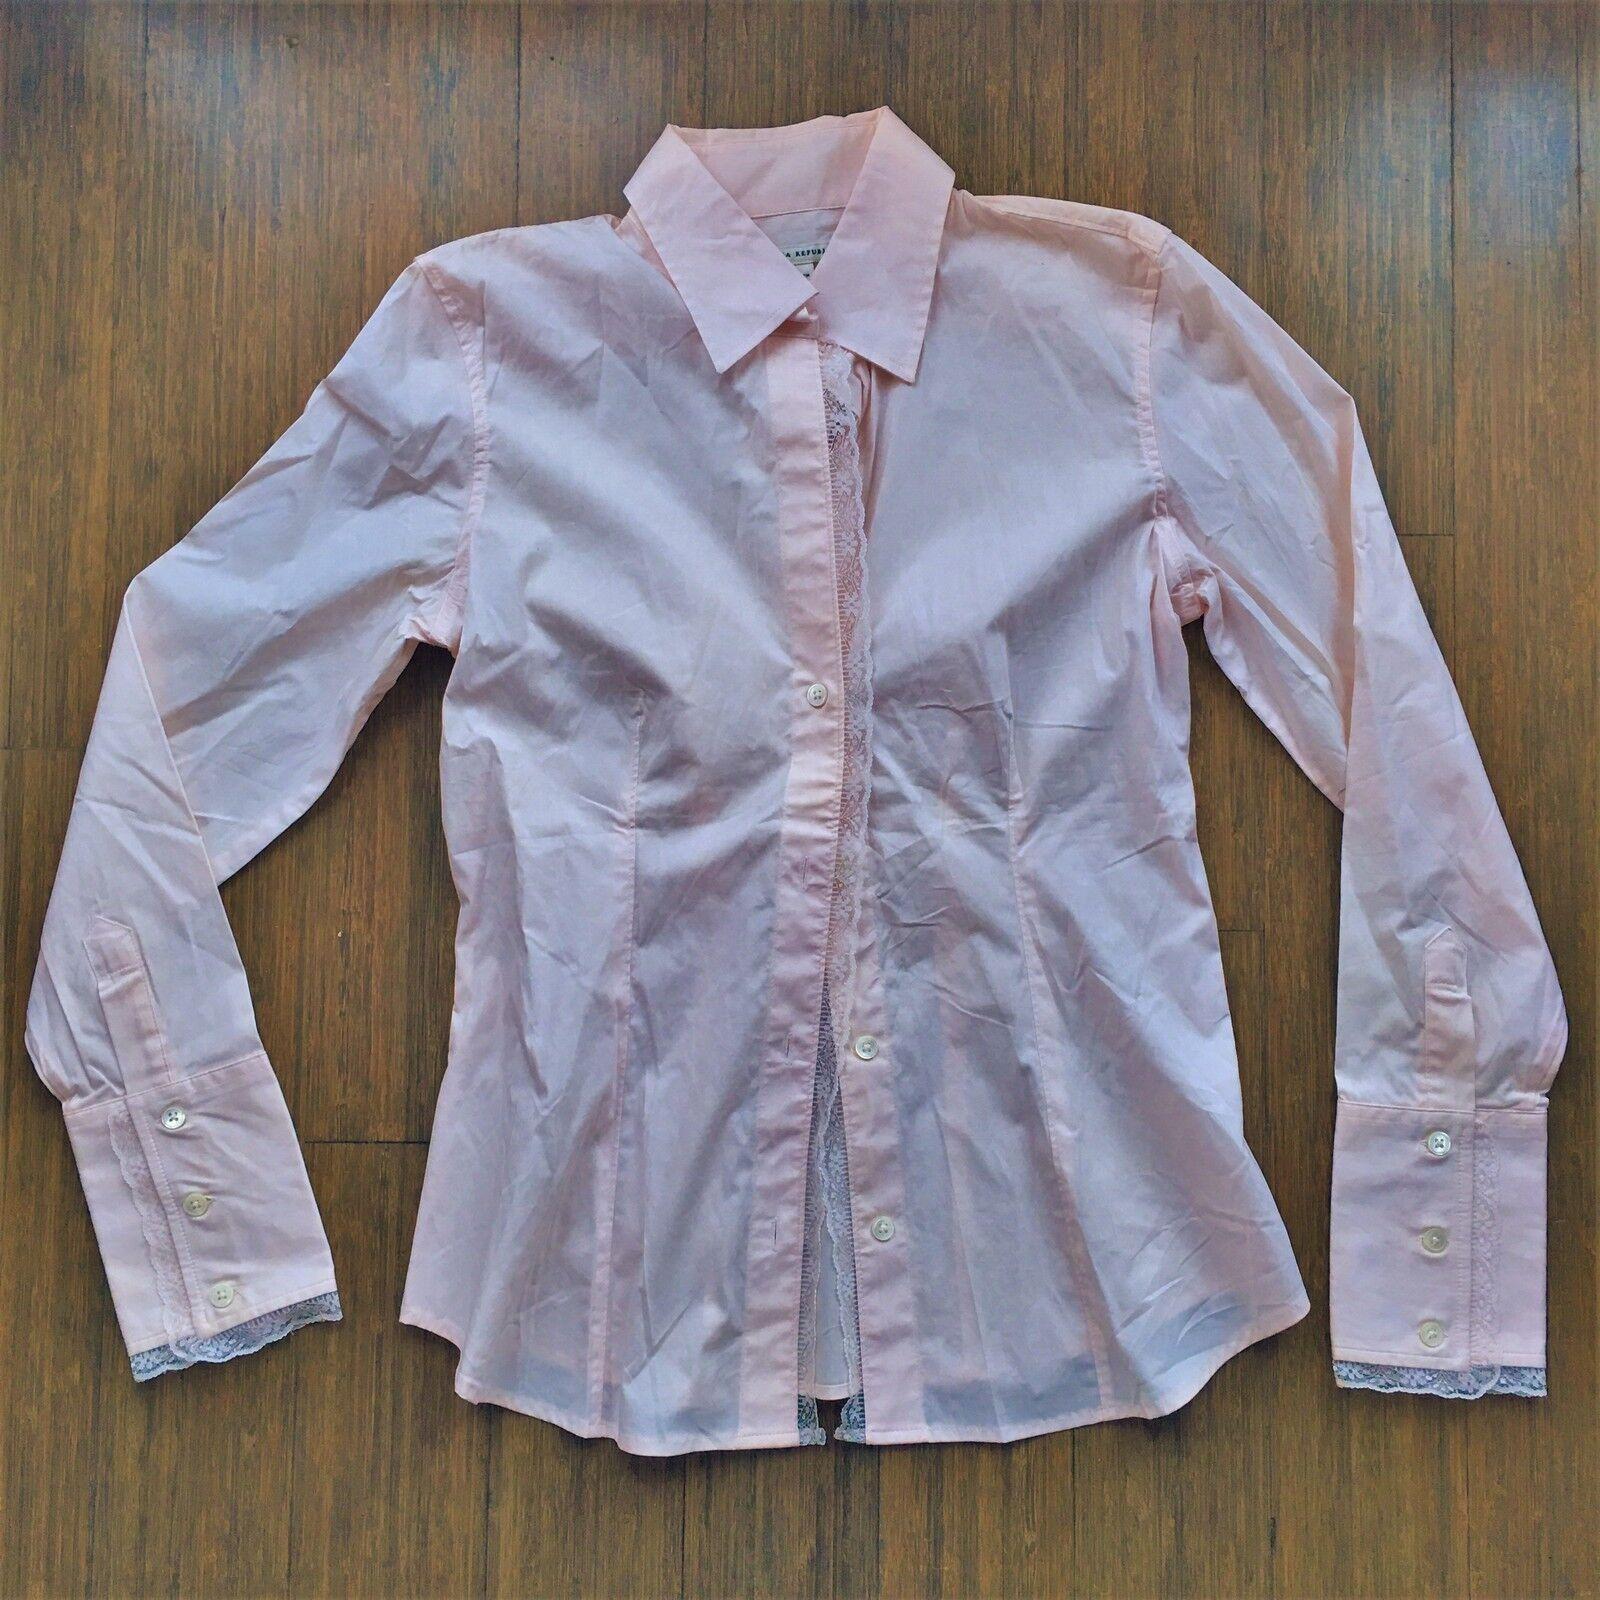 NWT Banana Republic Light Rosa Scalloped Lace Trim Button Up Down Shirt Blouse S